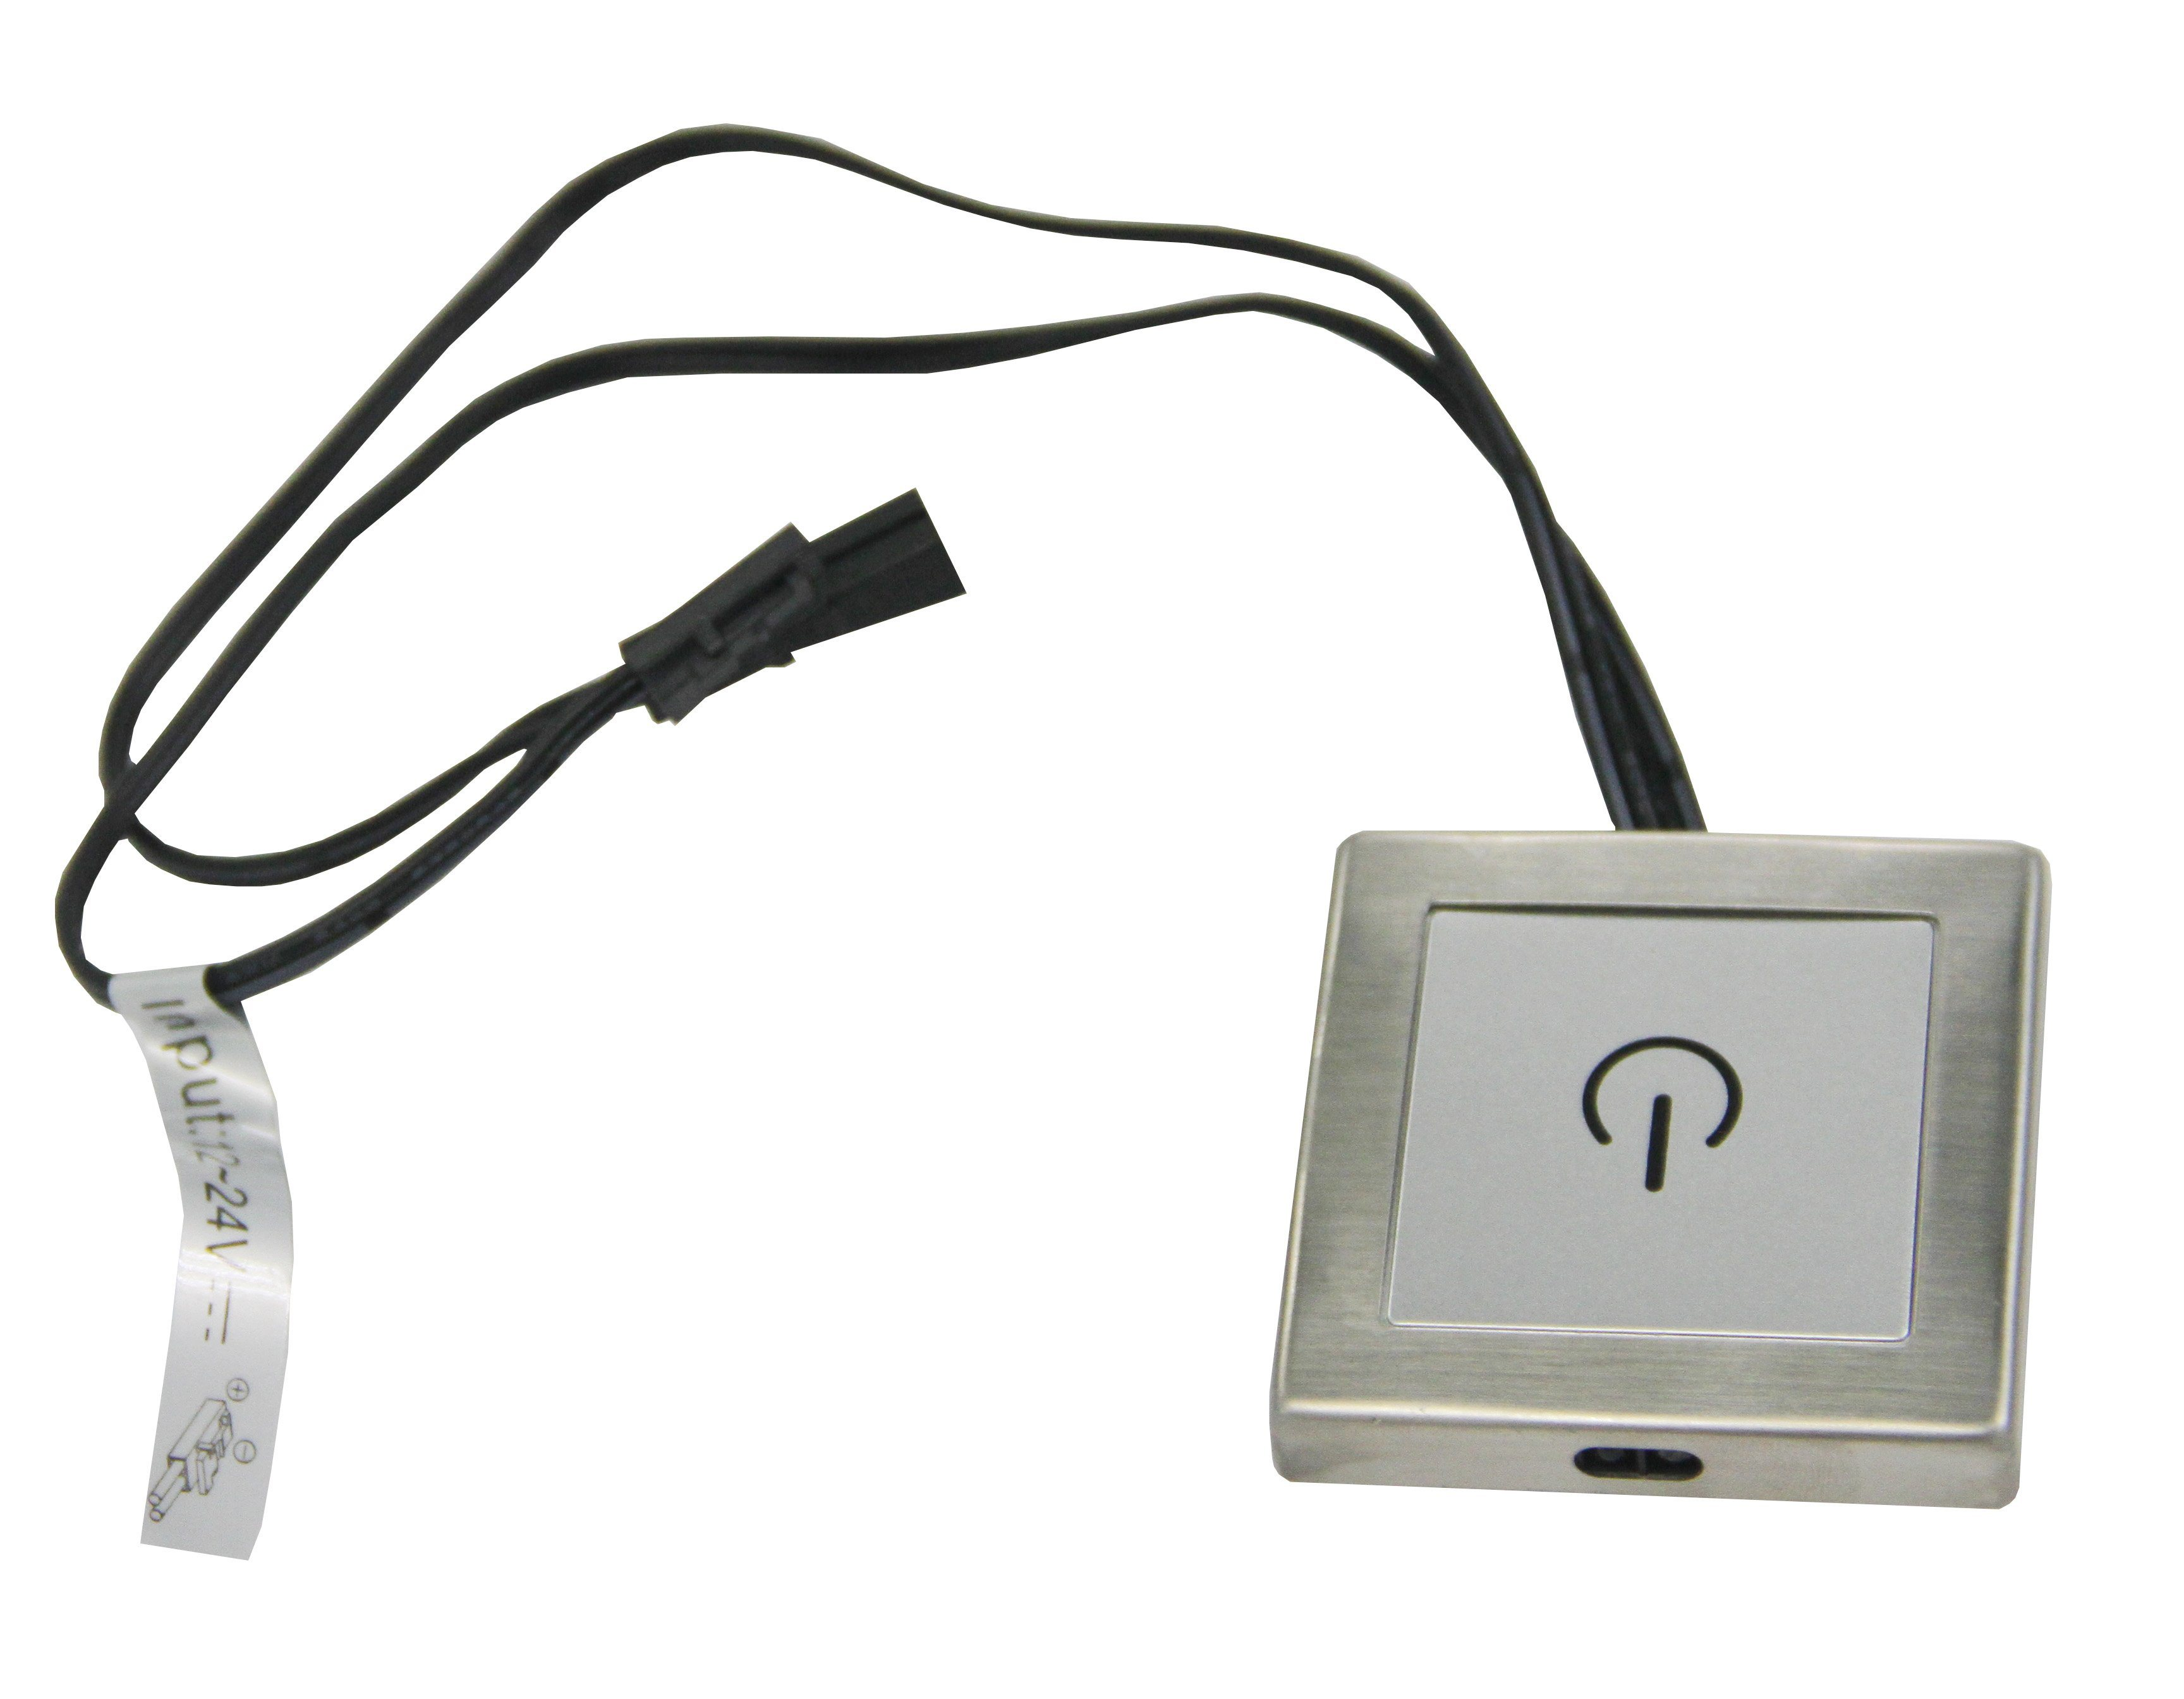 LED Automatic Door Sensor (sensor by door, surface mounted)